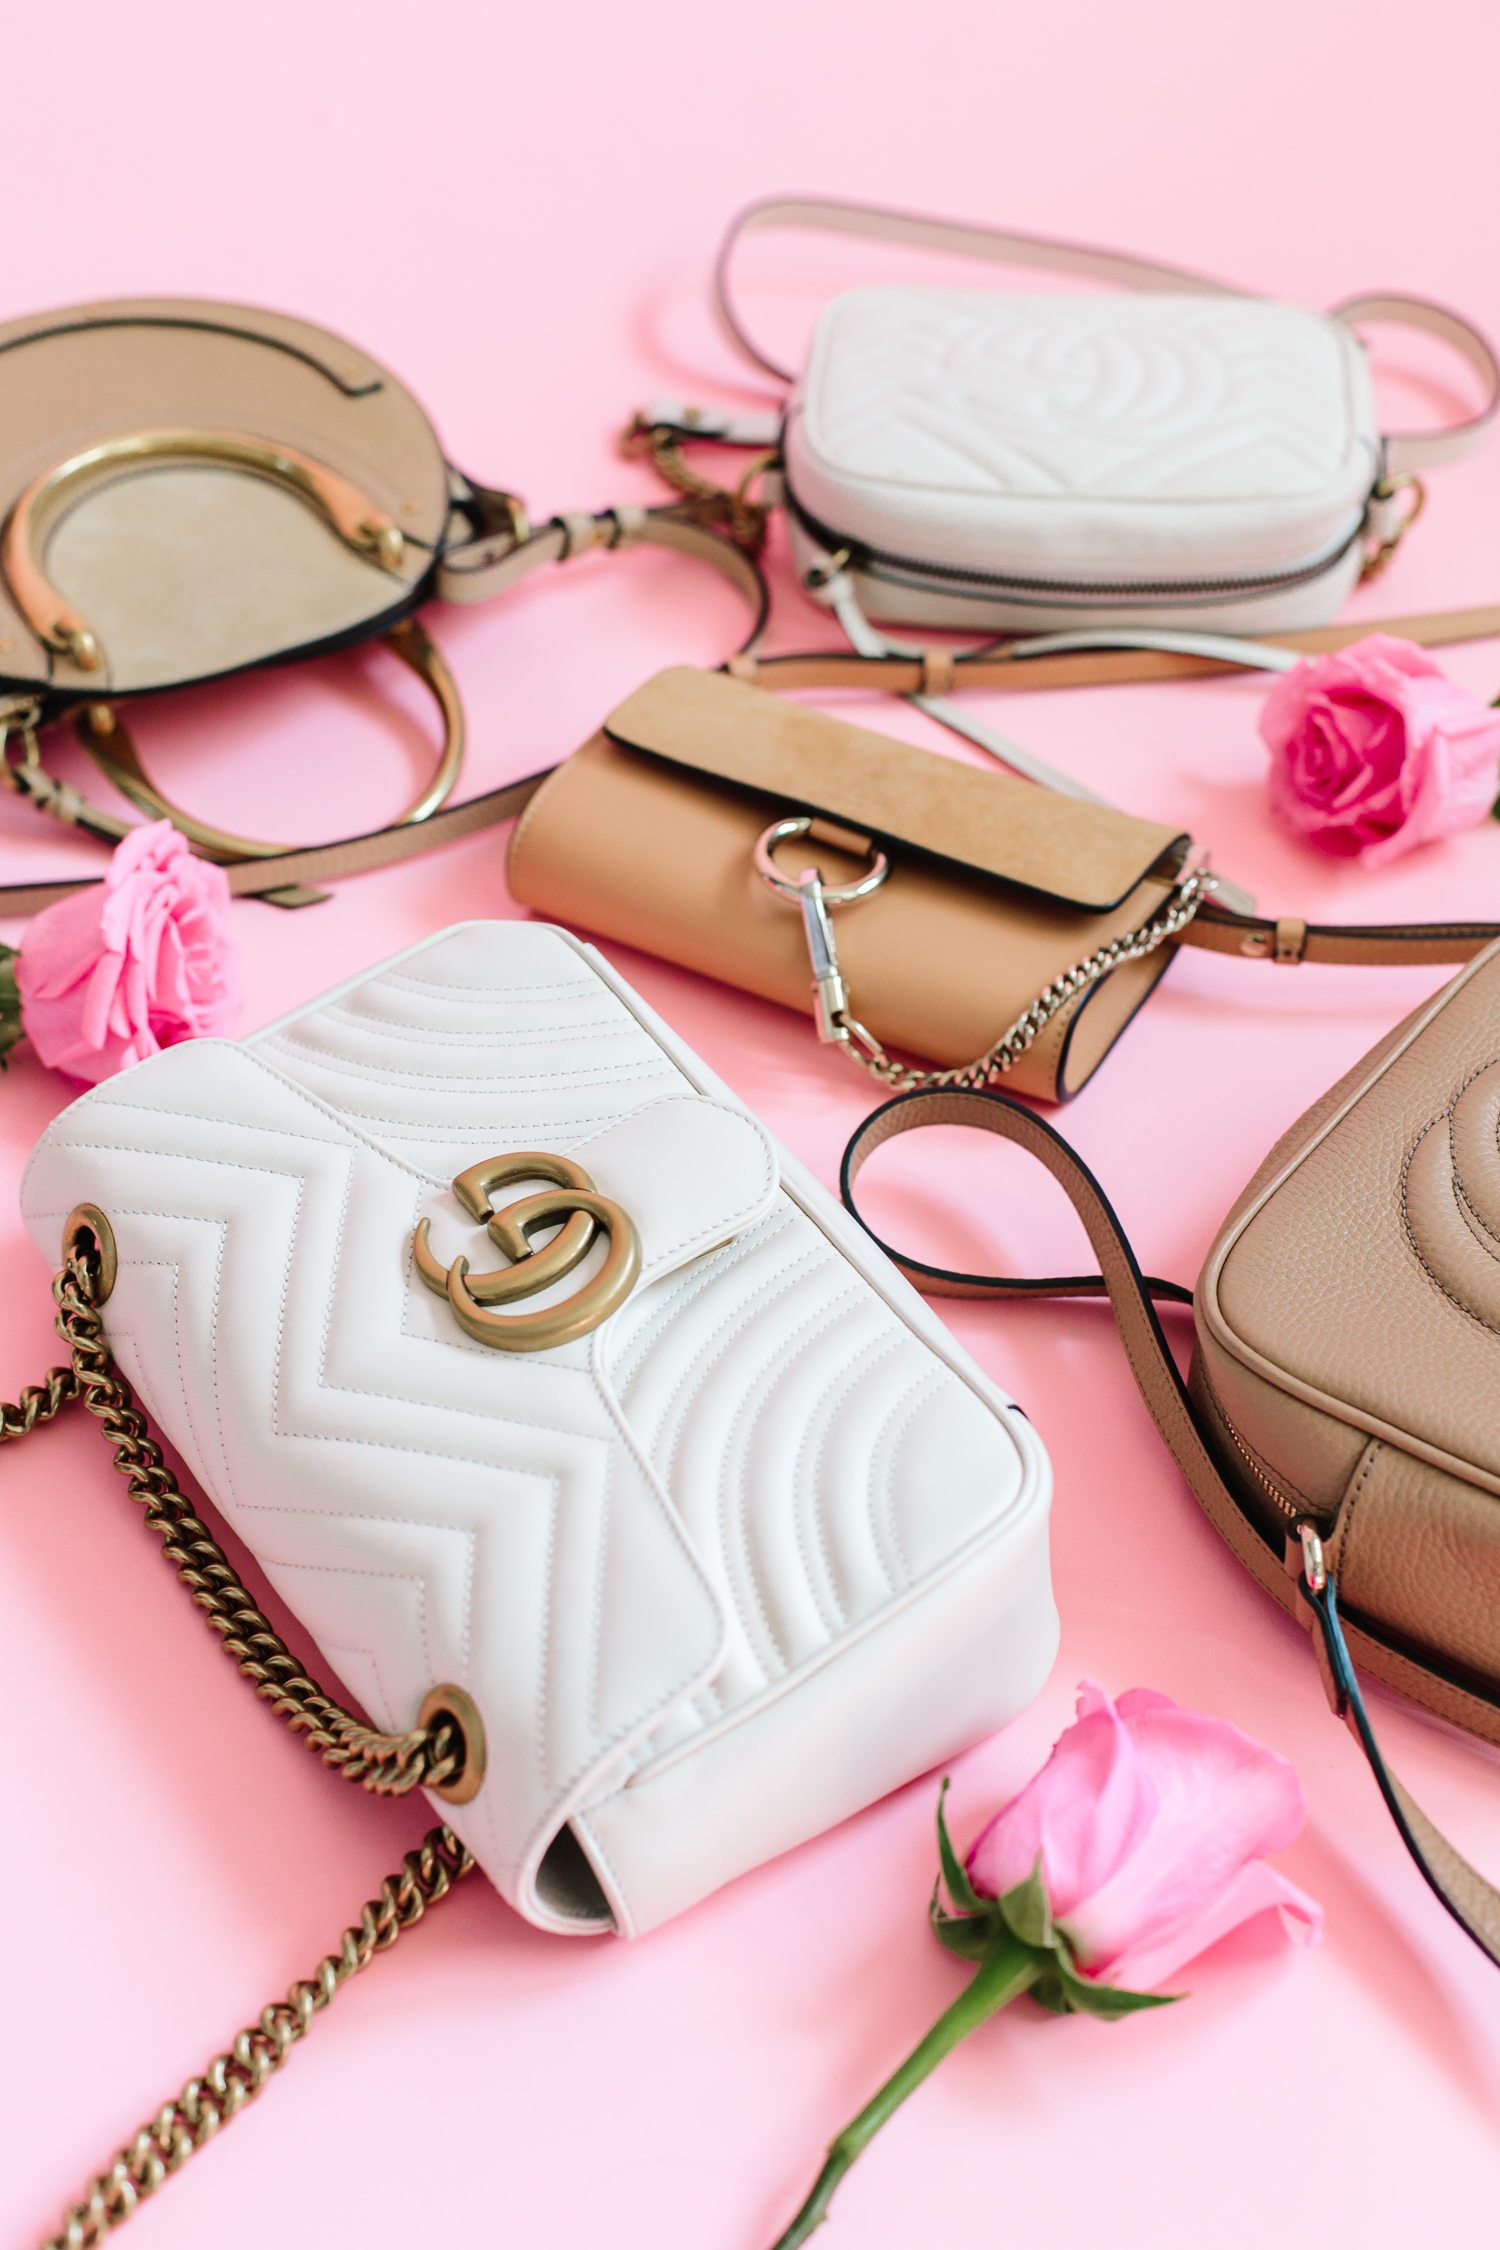 designer handbag review, gucci, chloe, mytheresa.com